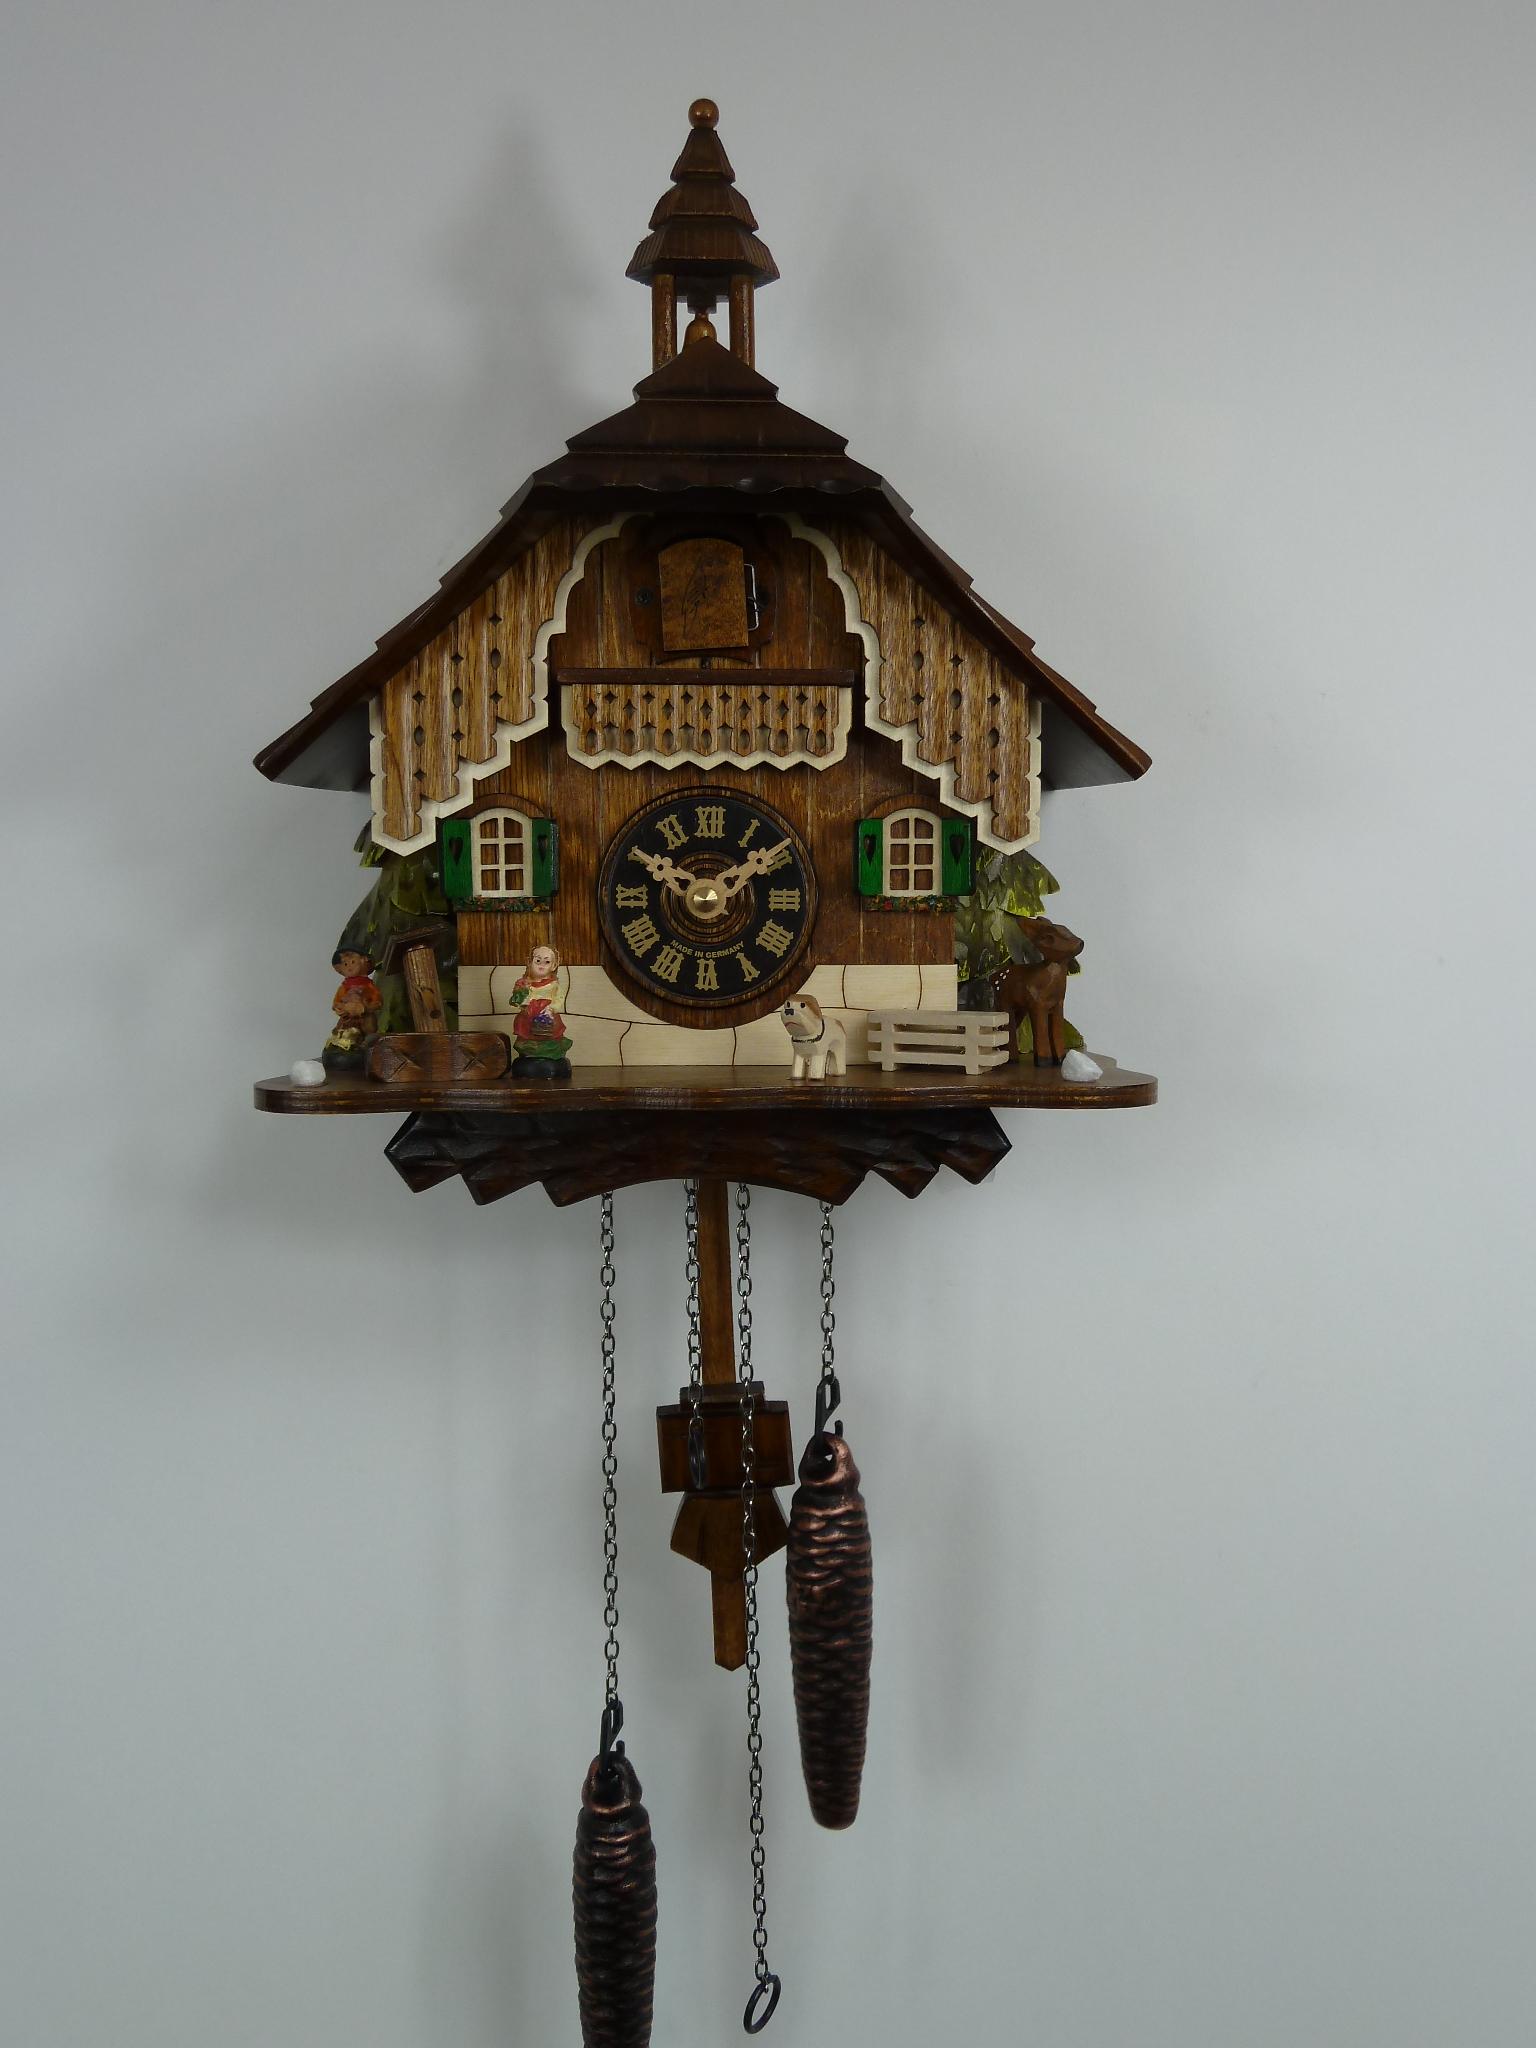 Cuckoo clock sales repair 4 year warranty rhythm clocks 429q engstleralexander taron bell tower cuckoo clock amipublicfo Images